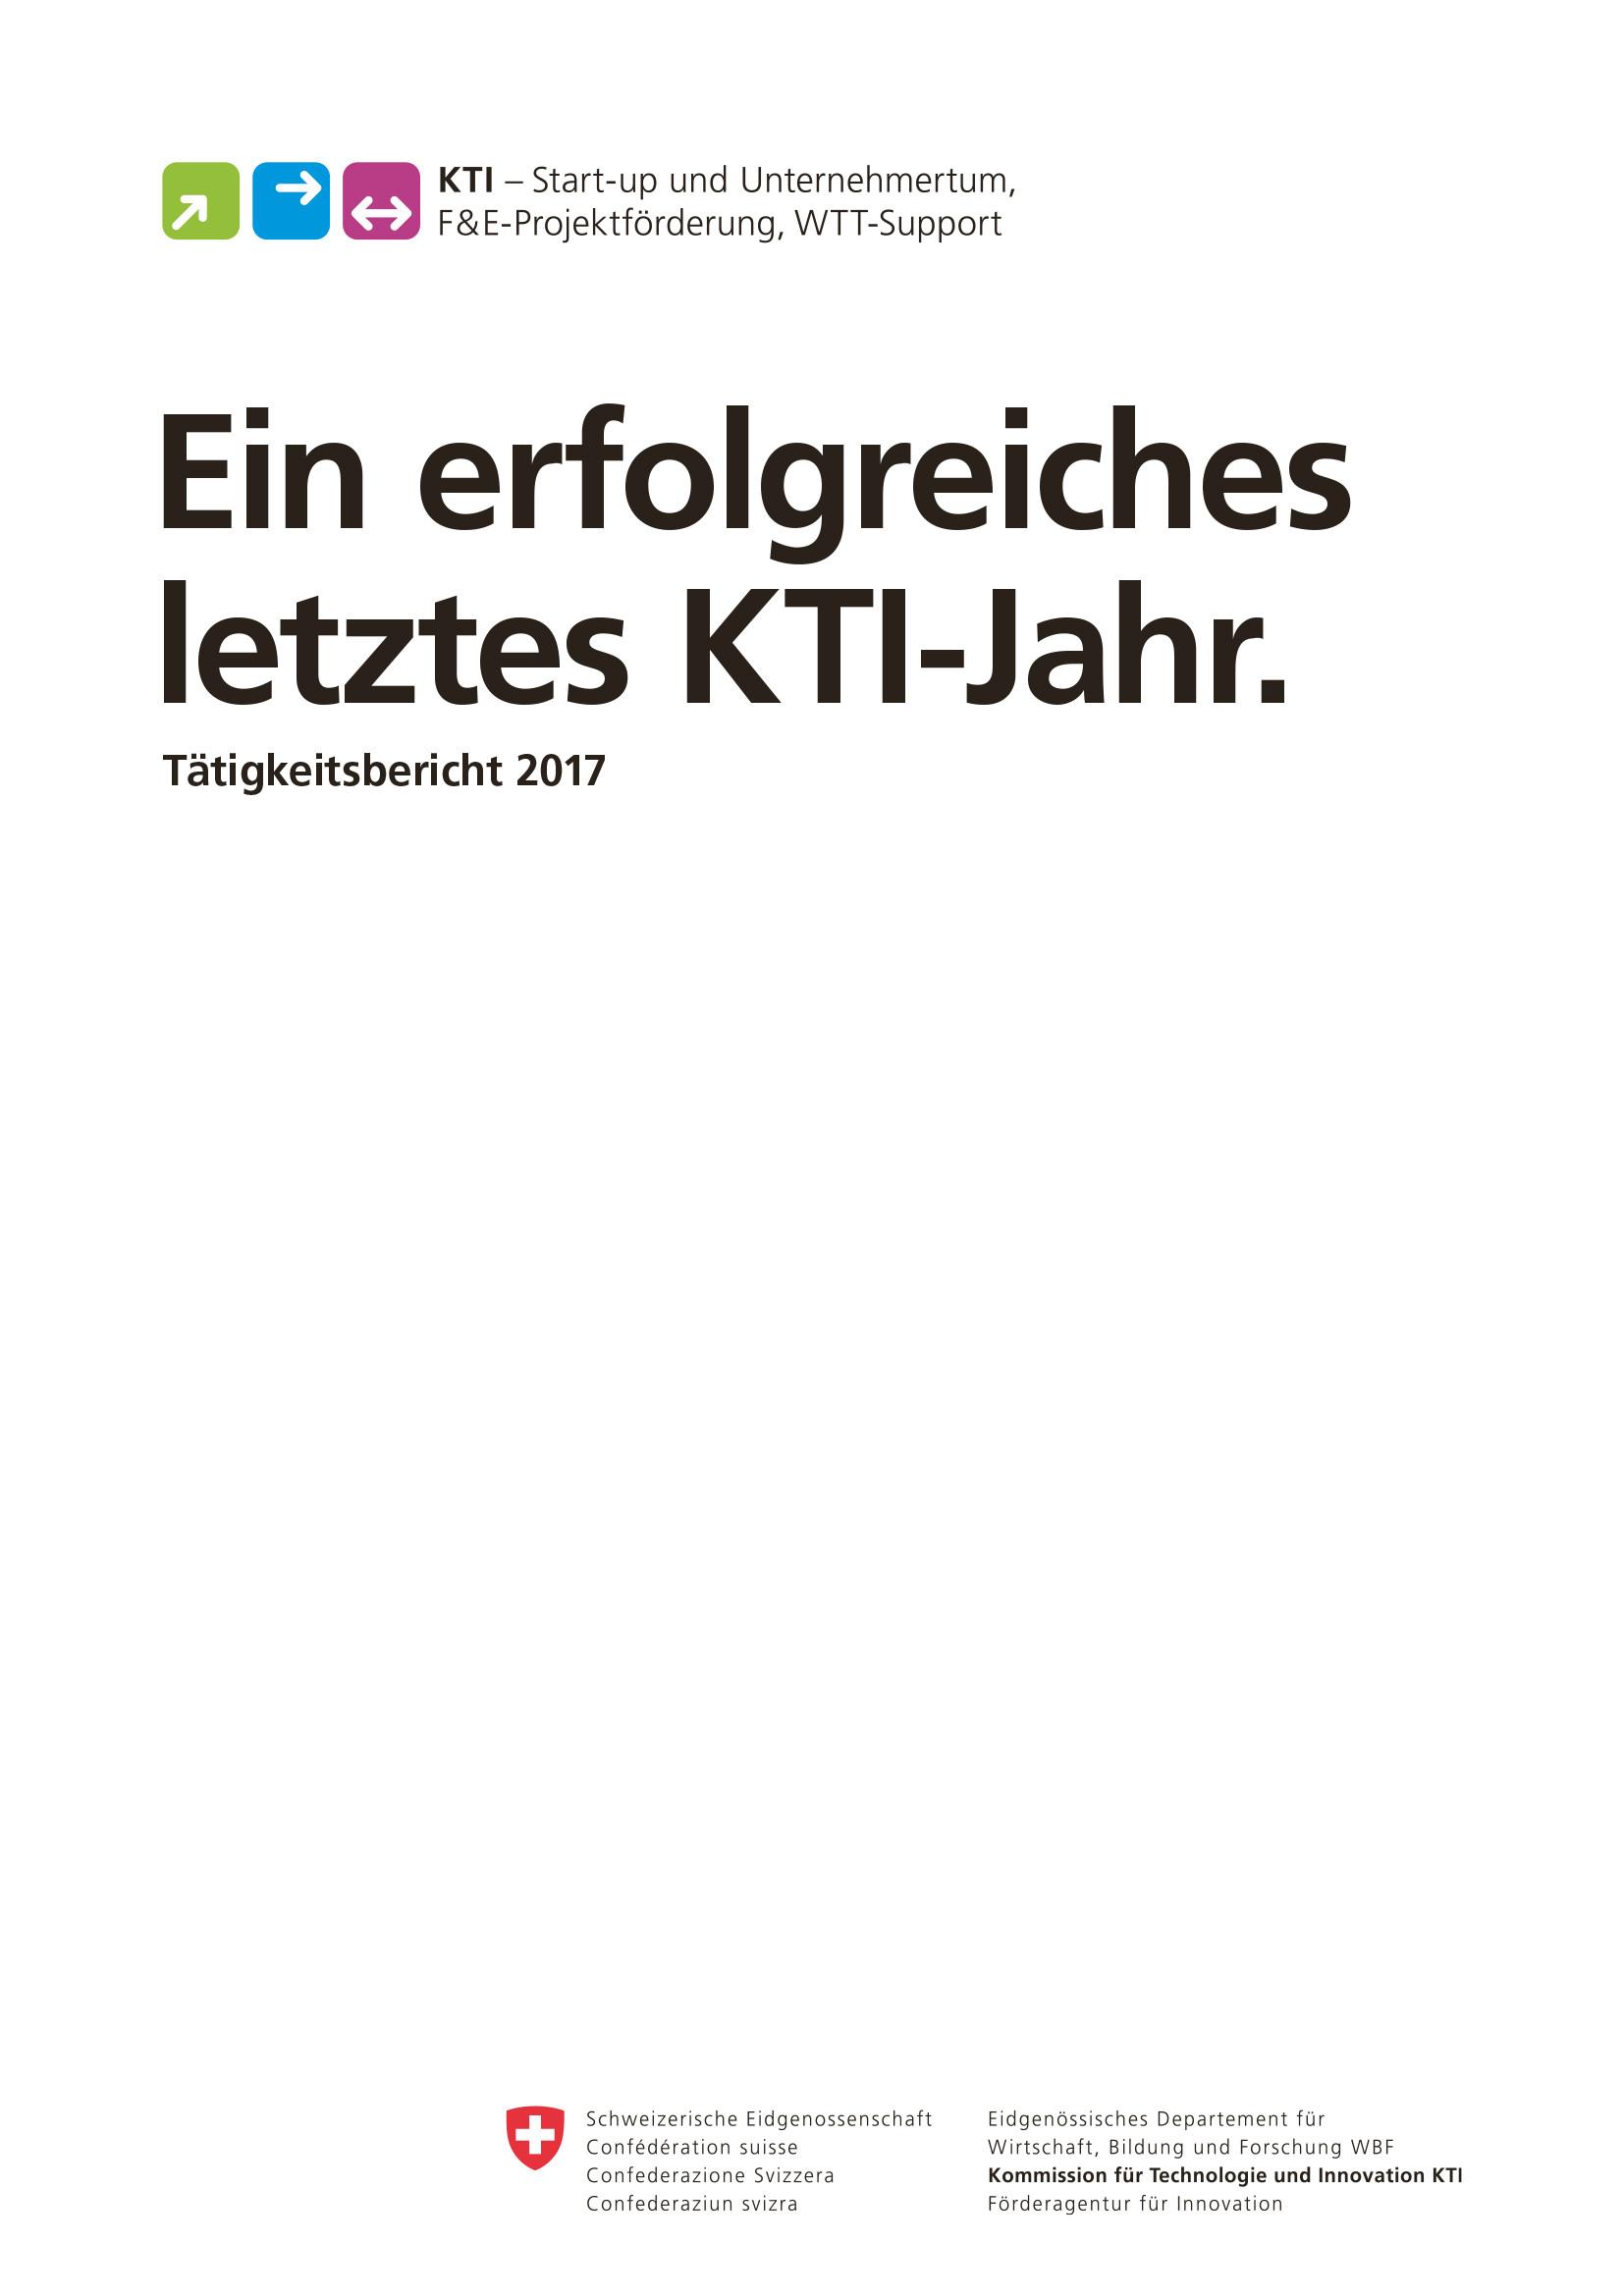 KTI als Schlüsselakteurin in der Innovationslandschaft.